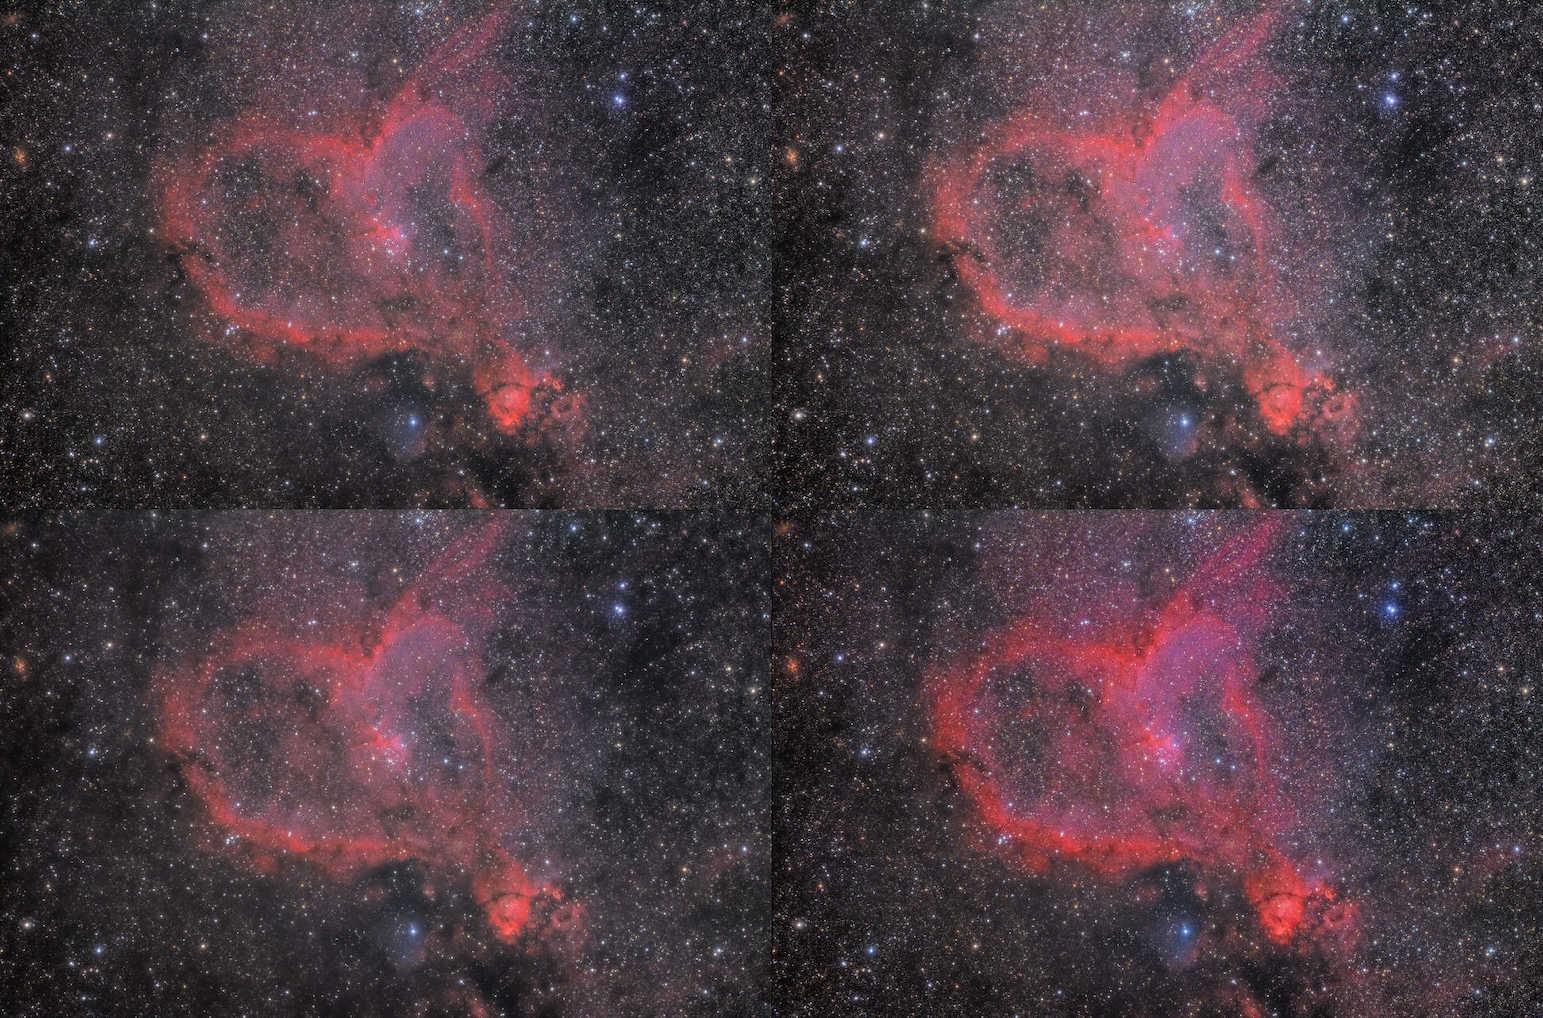 A 4-panel image.